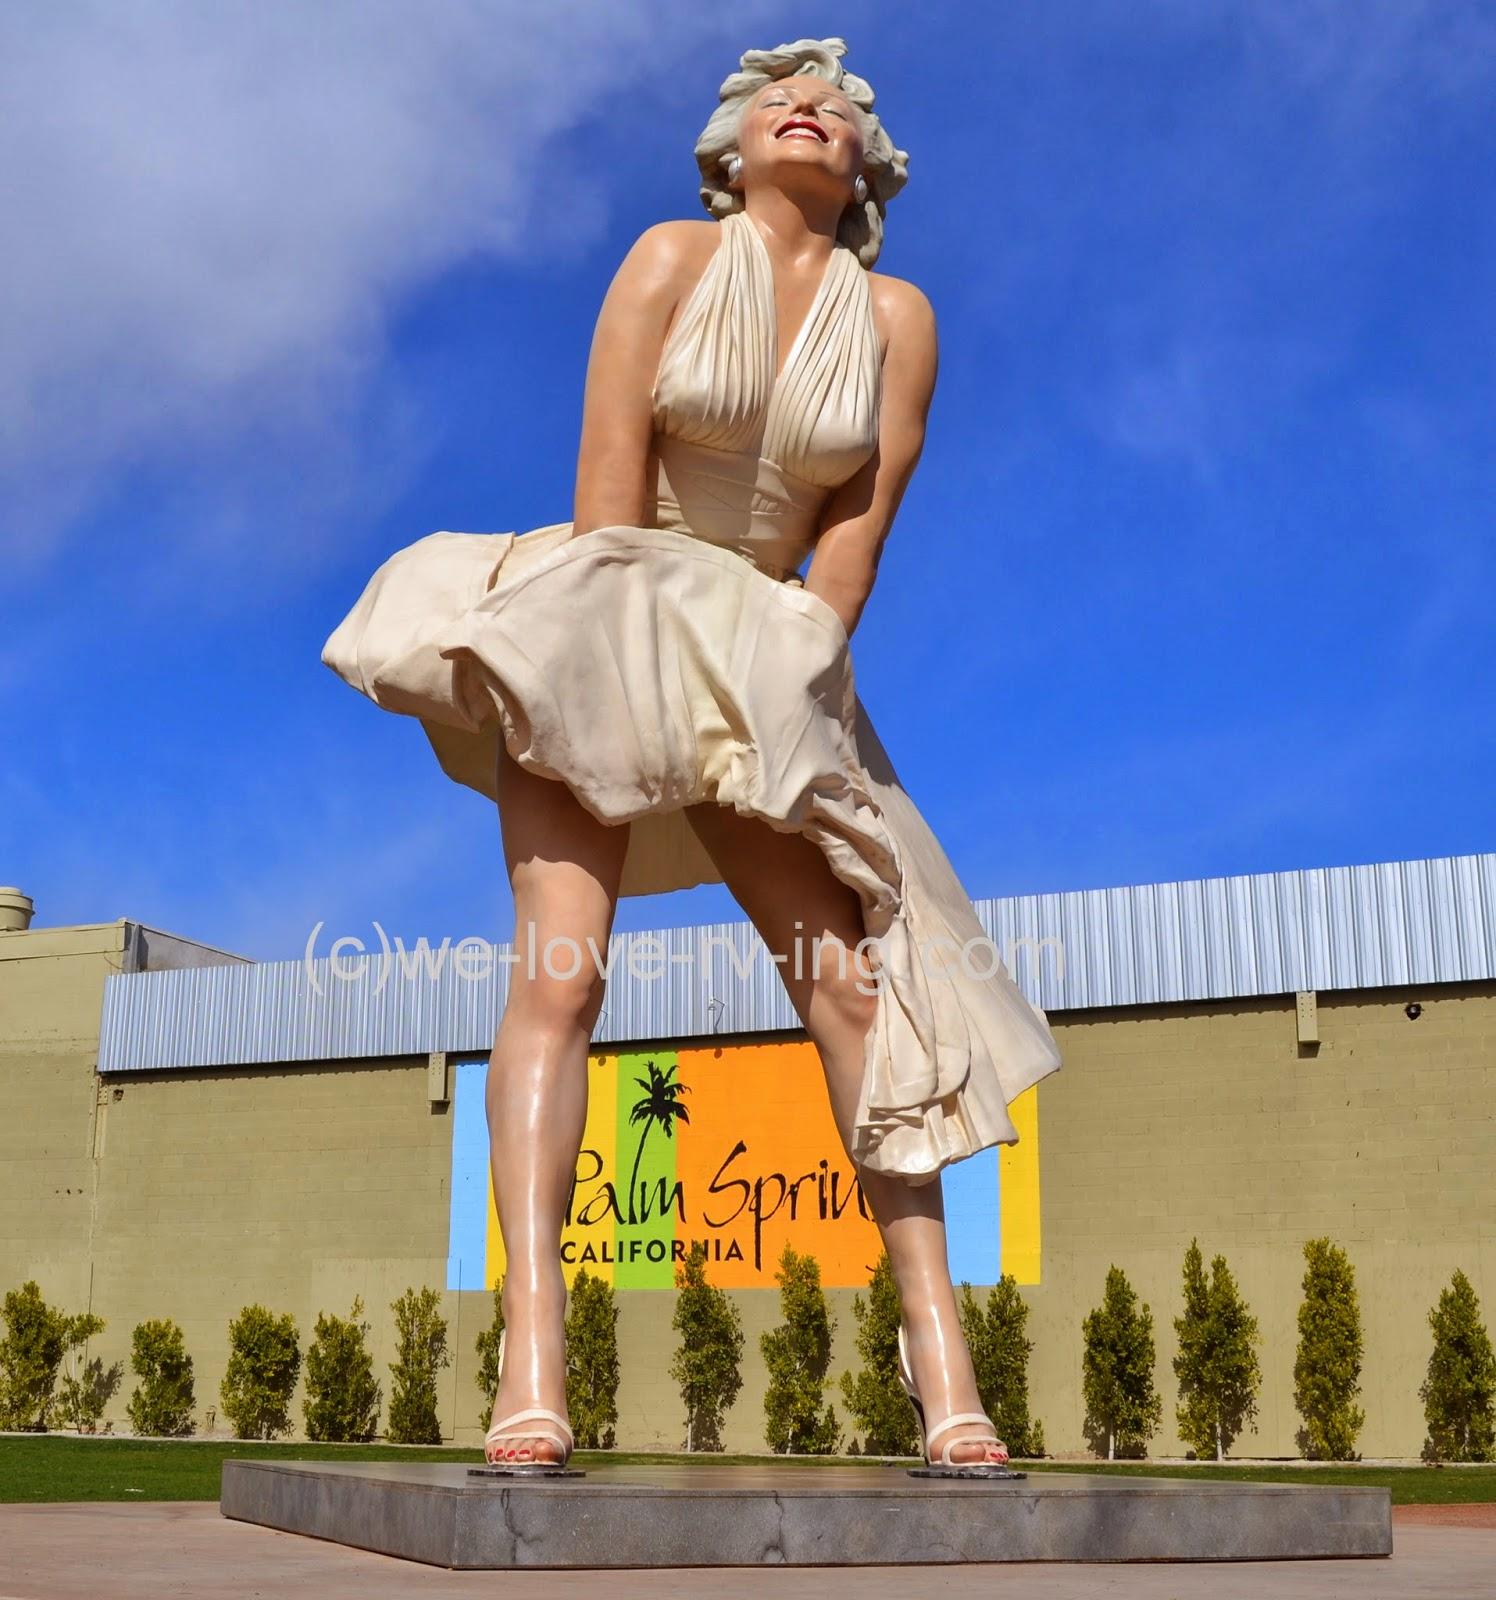 We love rv 39 ing mar 29 2014 for Marilyn monroe palm springs home